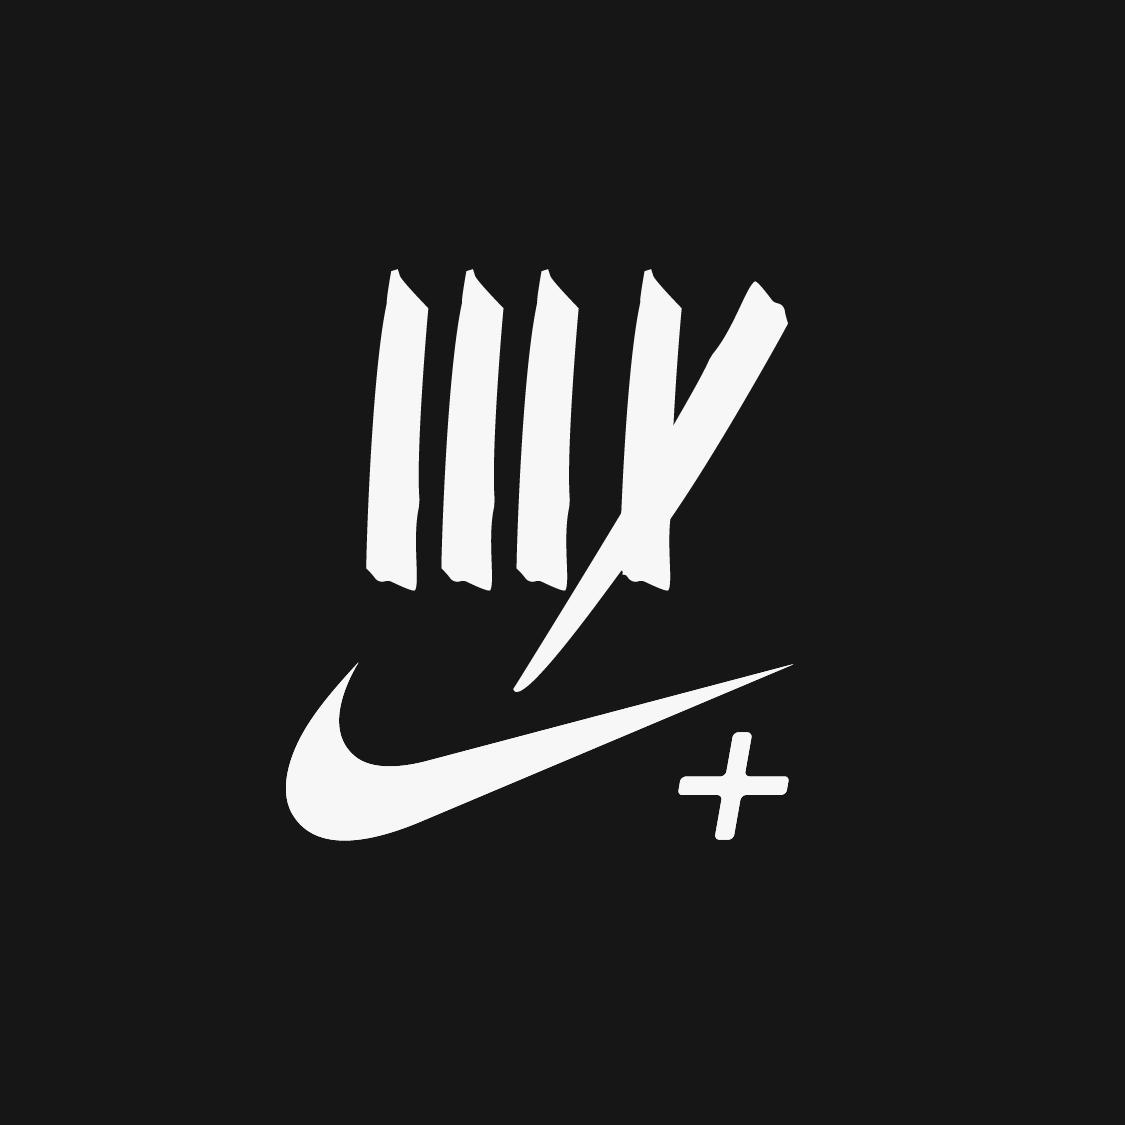 all-logos-2020-04